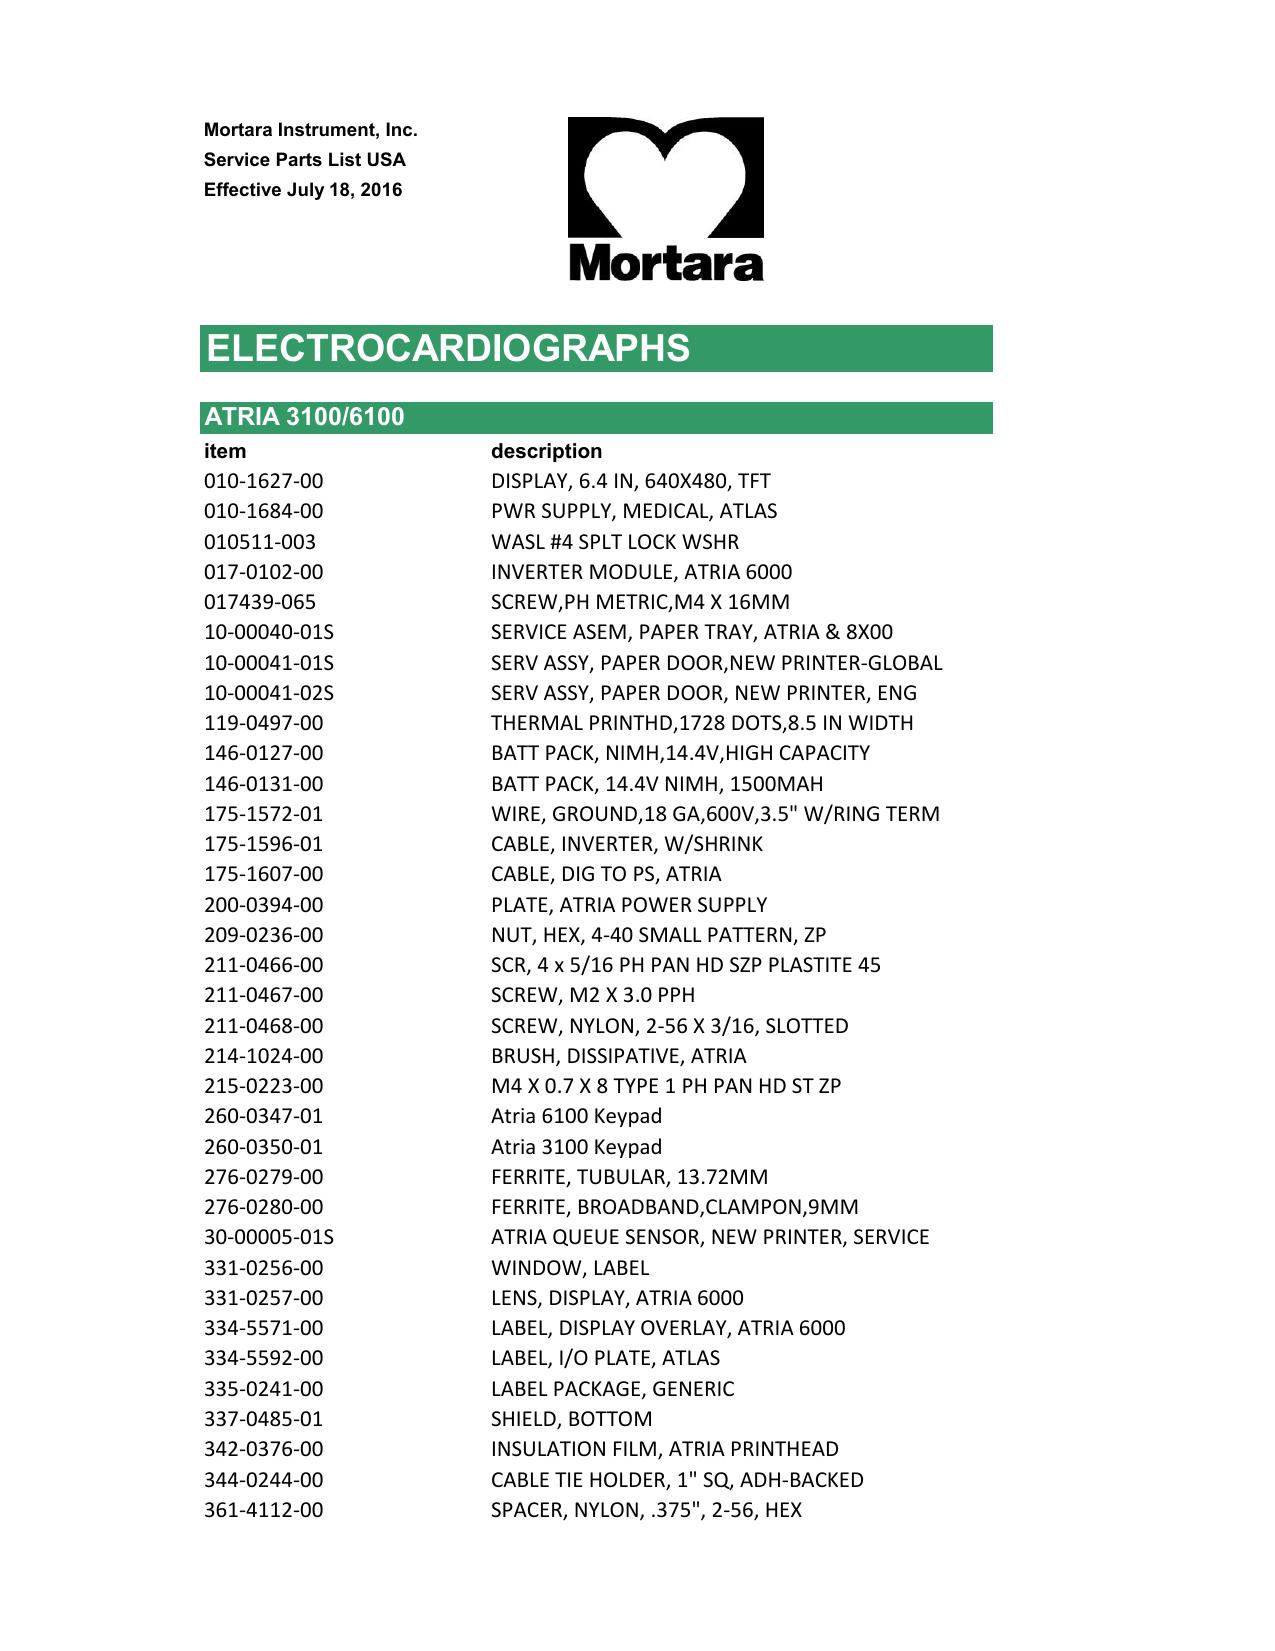 ELECTROCARDIOGRAPHS - Mortara Support Website | manualzz com